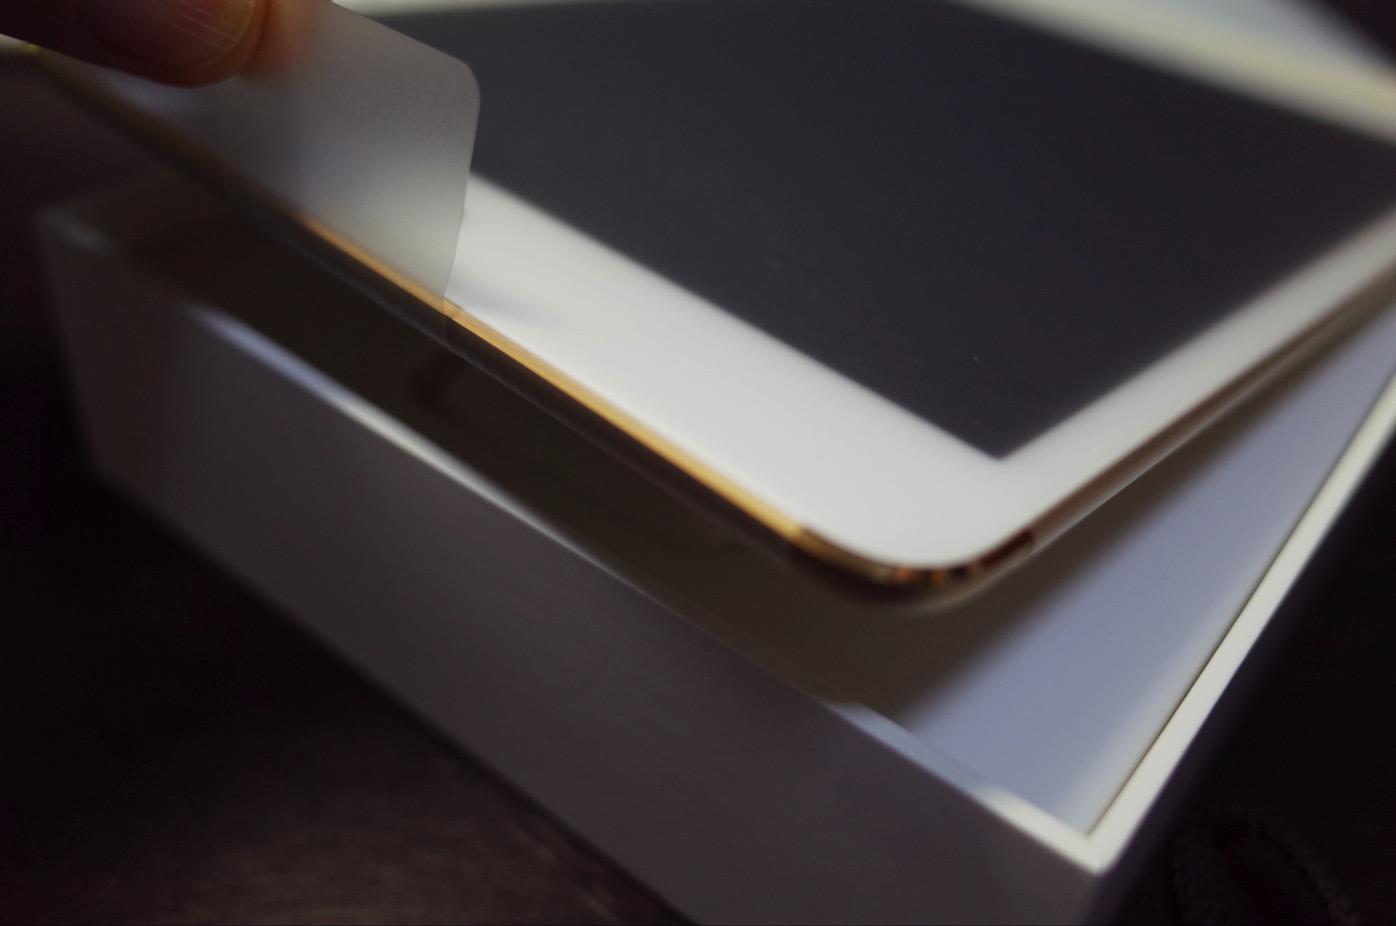 iPad mini 4-5